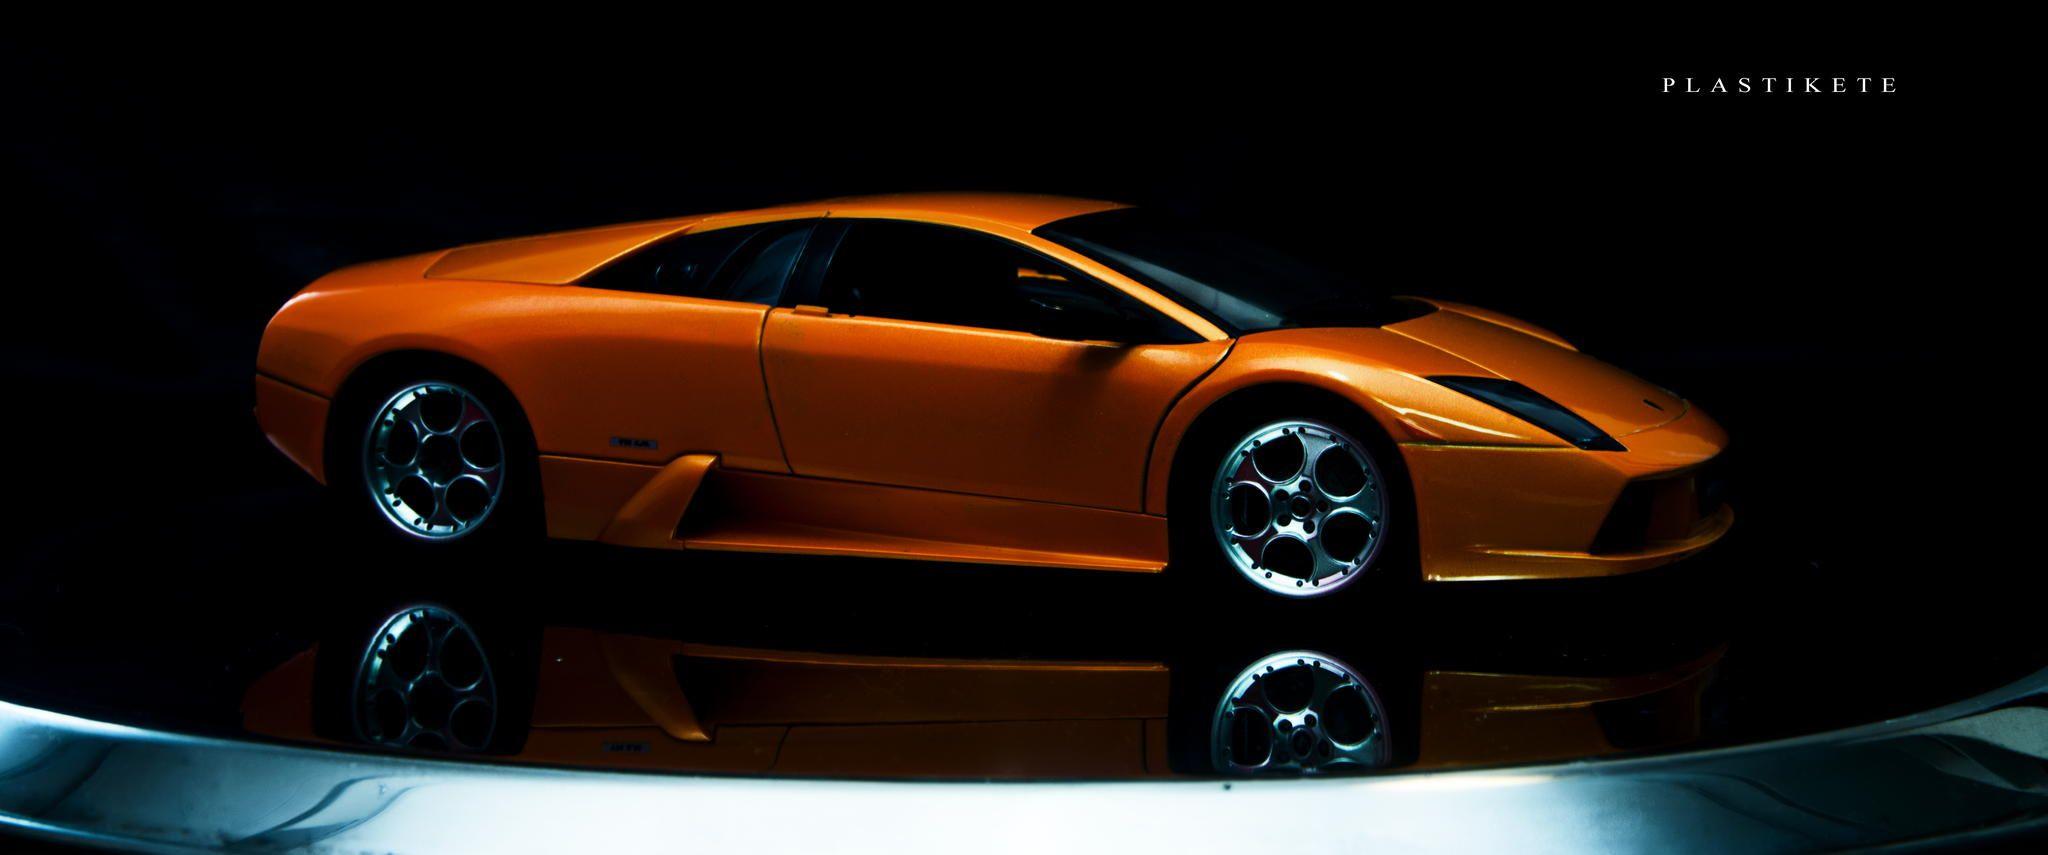 Lamborghini Murcielago By Plastikete By Plastikete On 500px